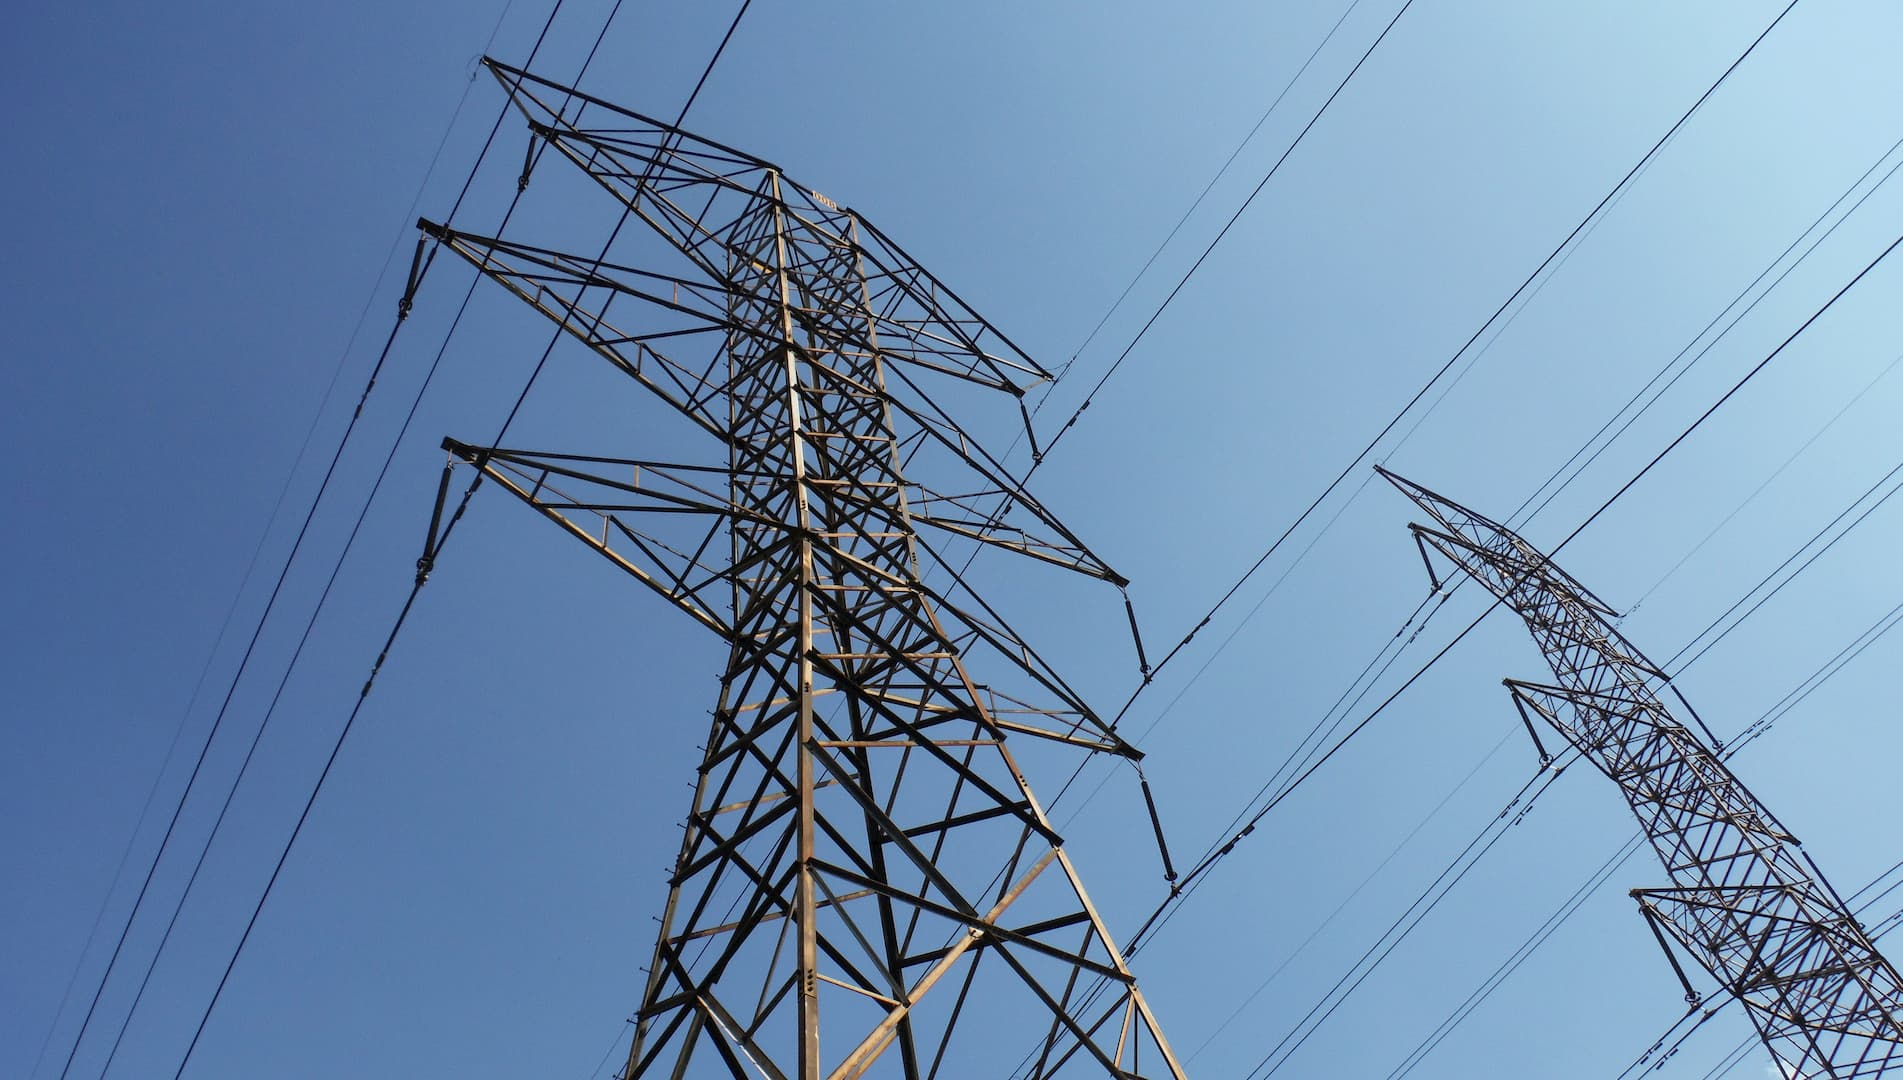 Demand Side Response helps balance the grid